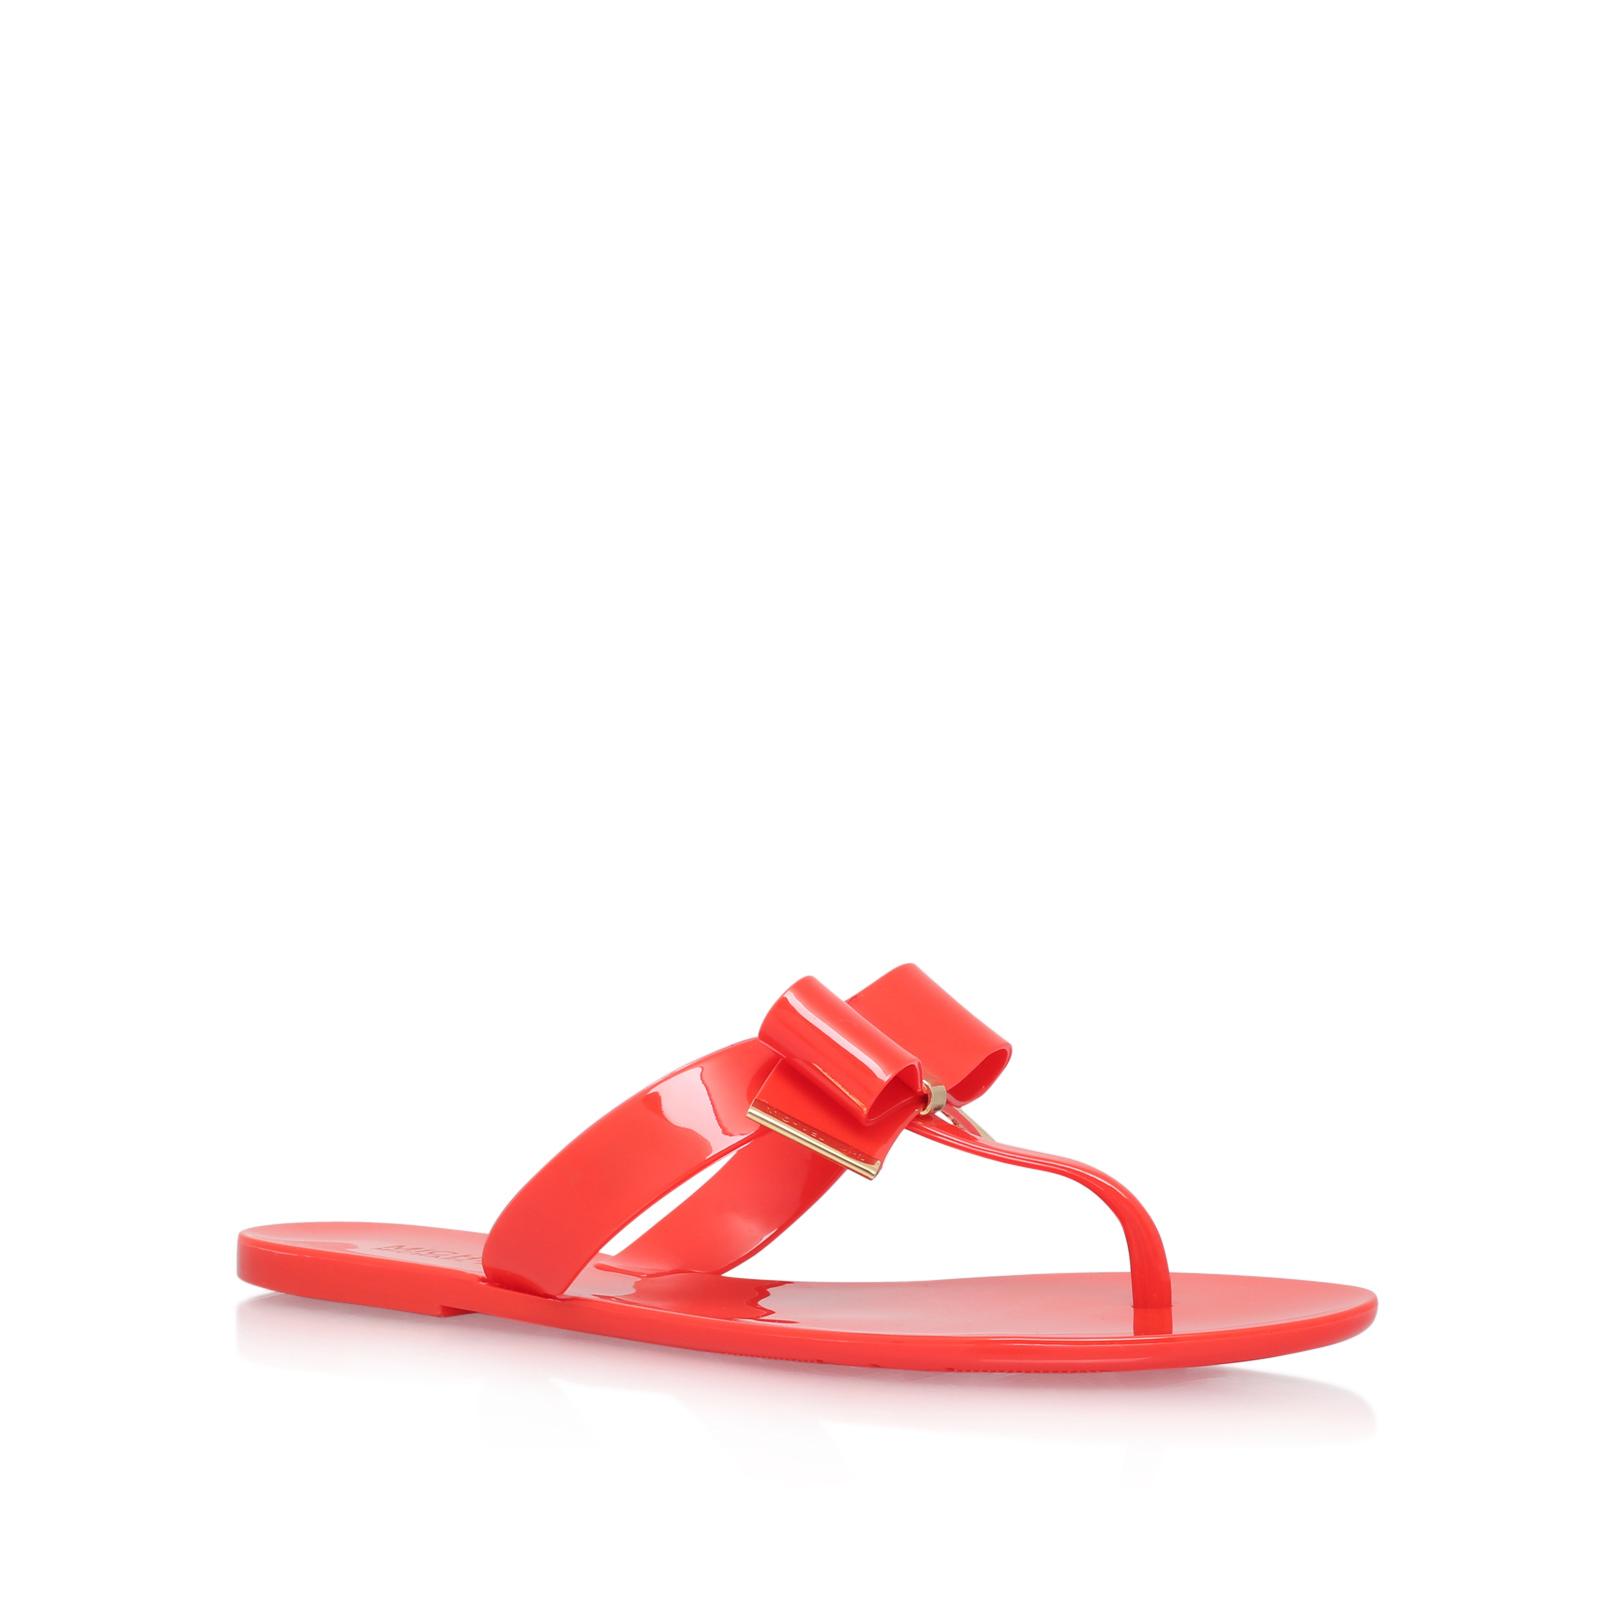 5df576437 KAYDEN THONG Michael Michael Kors Kayden Thong Orange Flat Sandals by MICHAEL  MICHAEL KORS